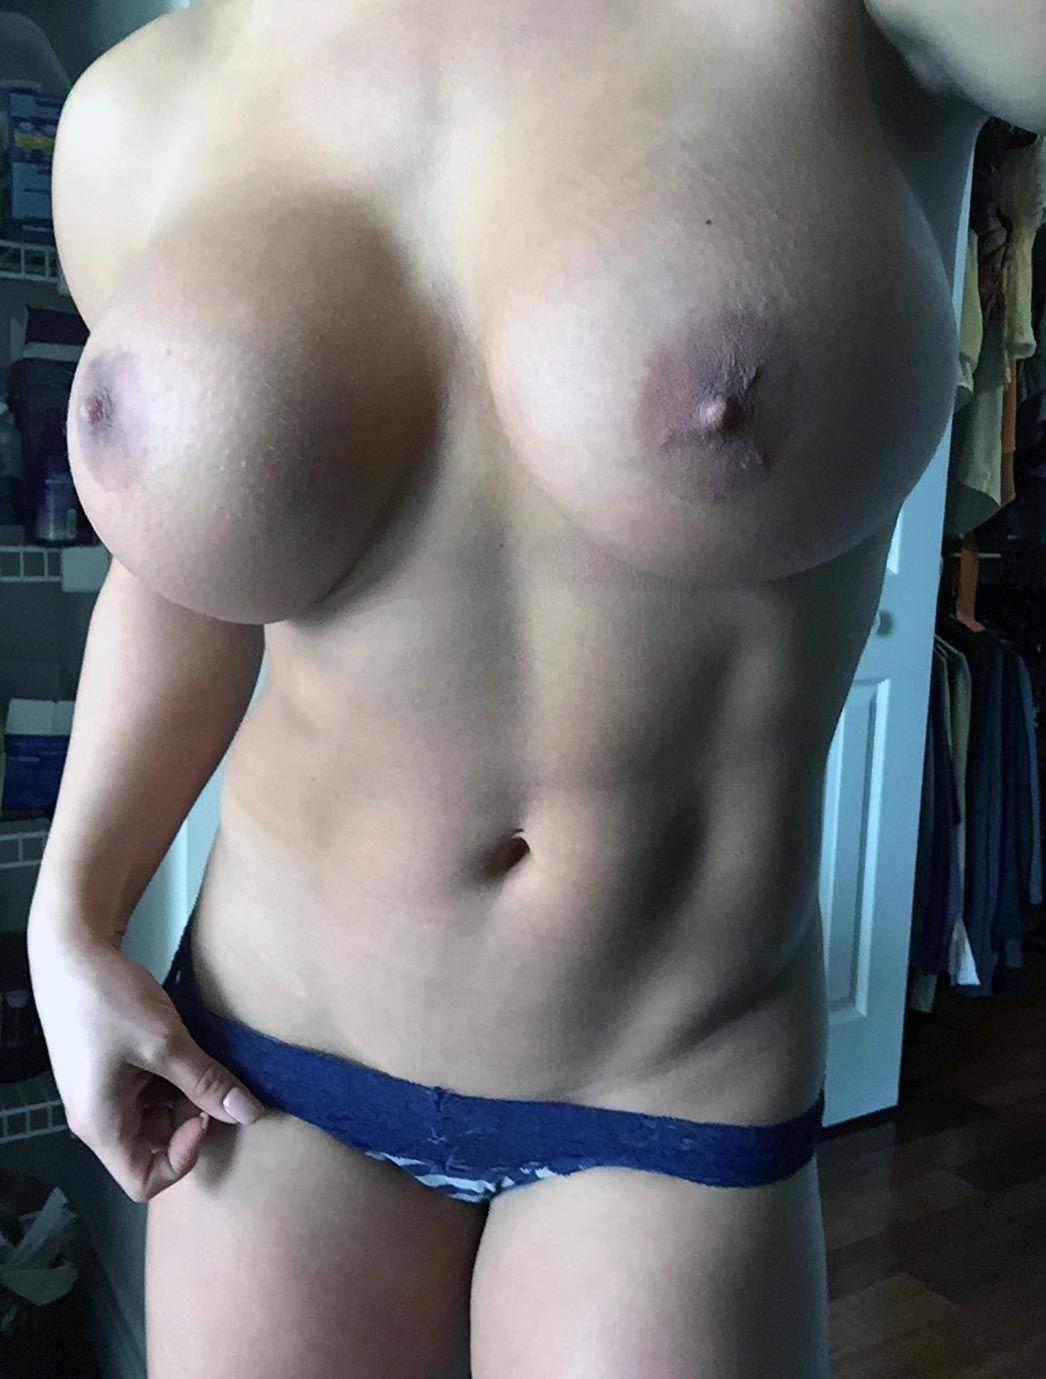 Celeste Bonin Nude Leaked The Fappening & Sexy 0208